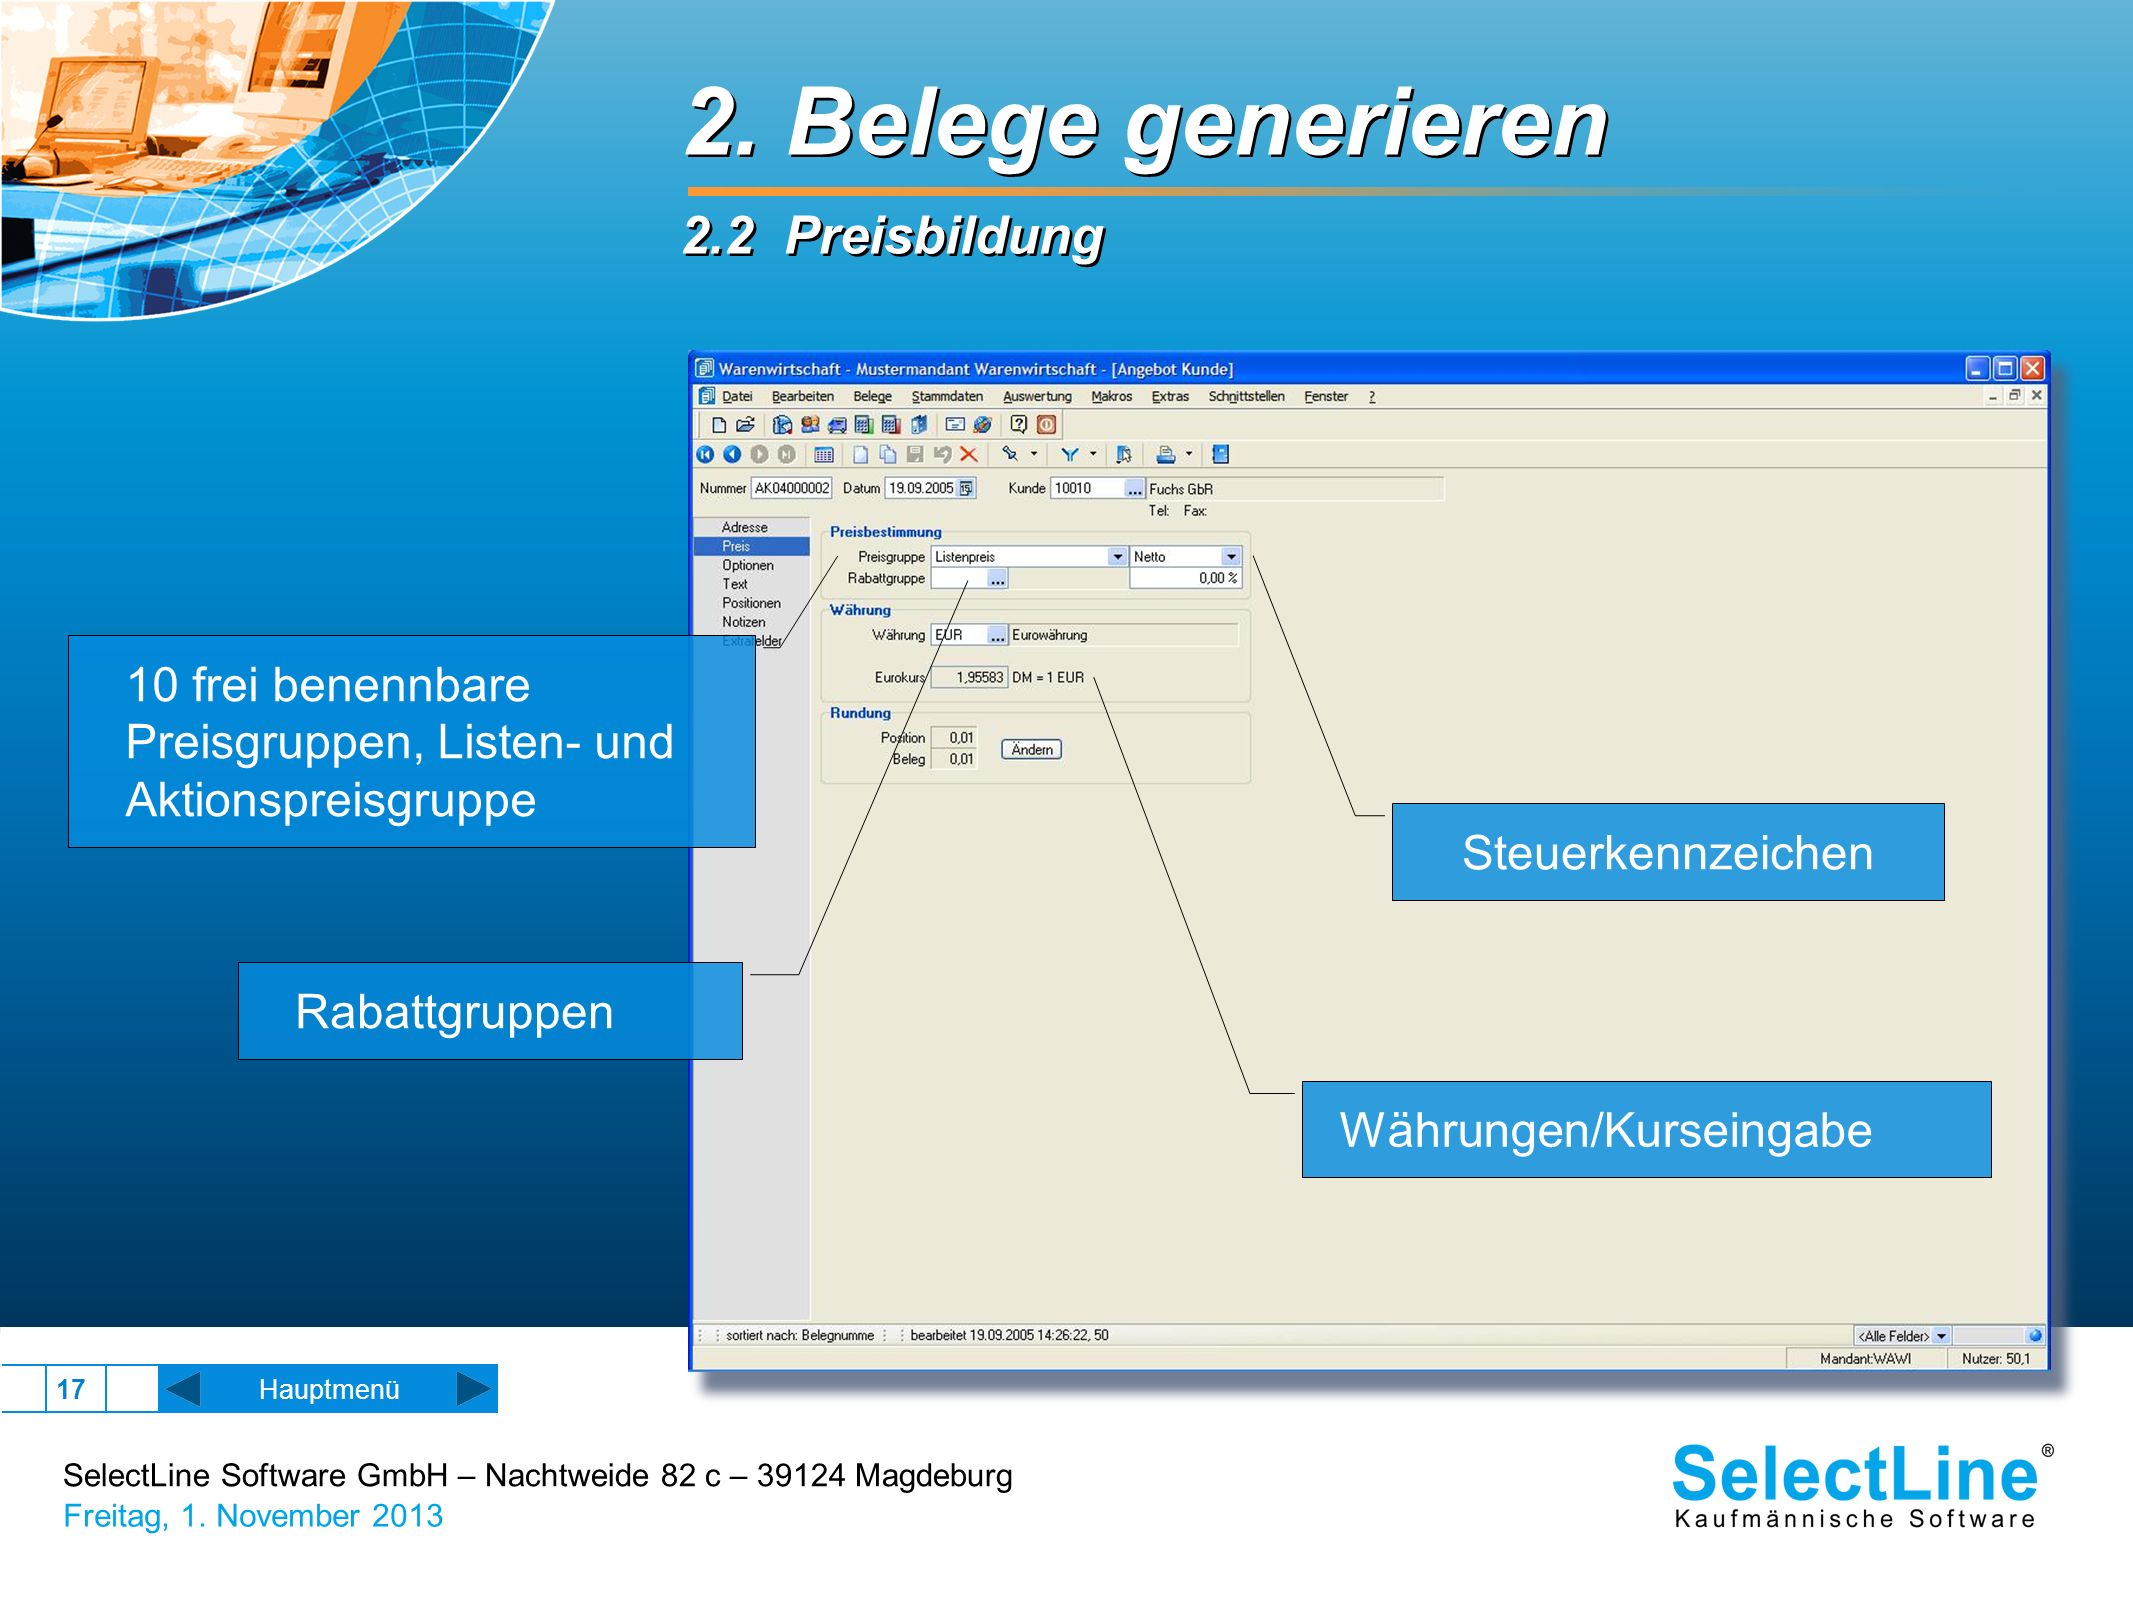 SelectLine Software GmbH – Nachtweide 82 c – 39124 Magdeburg Freitag, 1. November 2013 17 2. Belege generieren 2.2 Preisbildung 2. Belege generieren 2